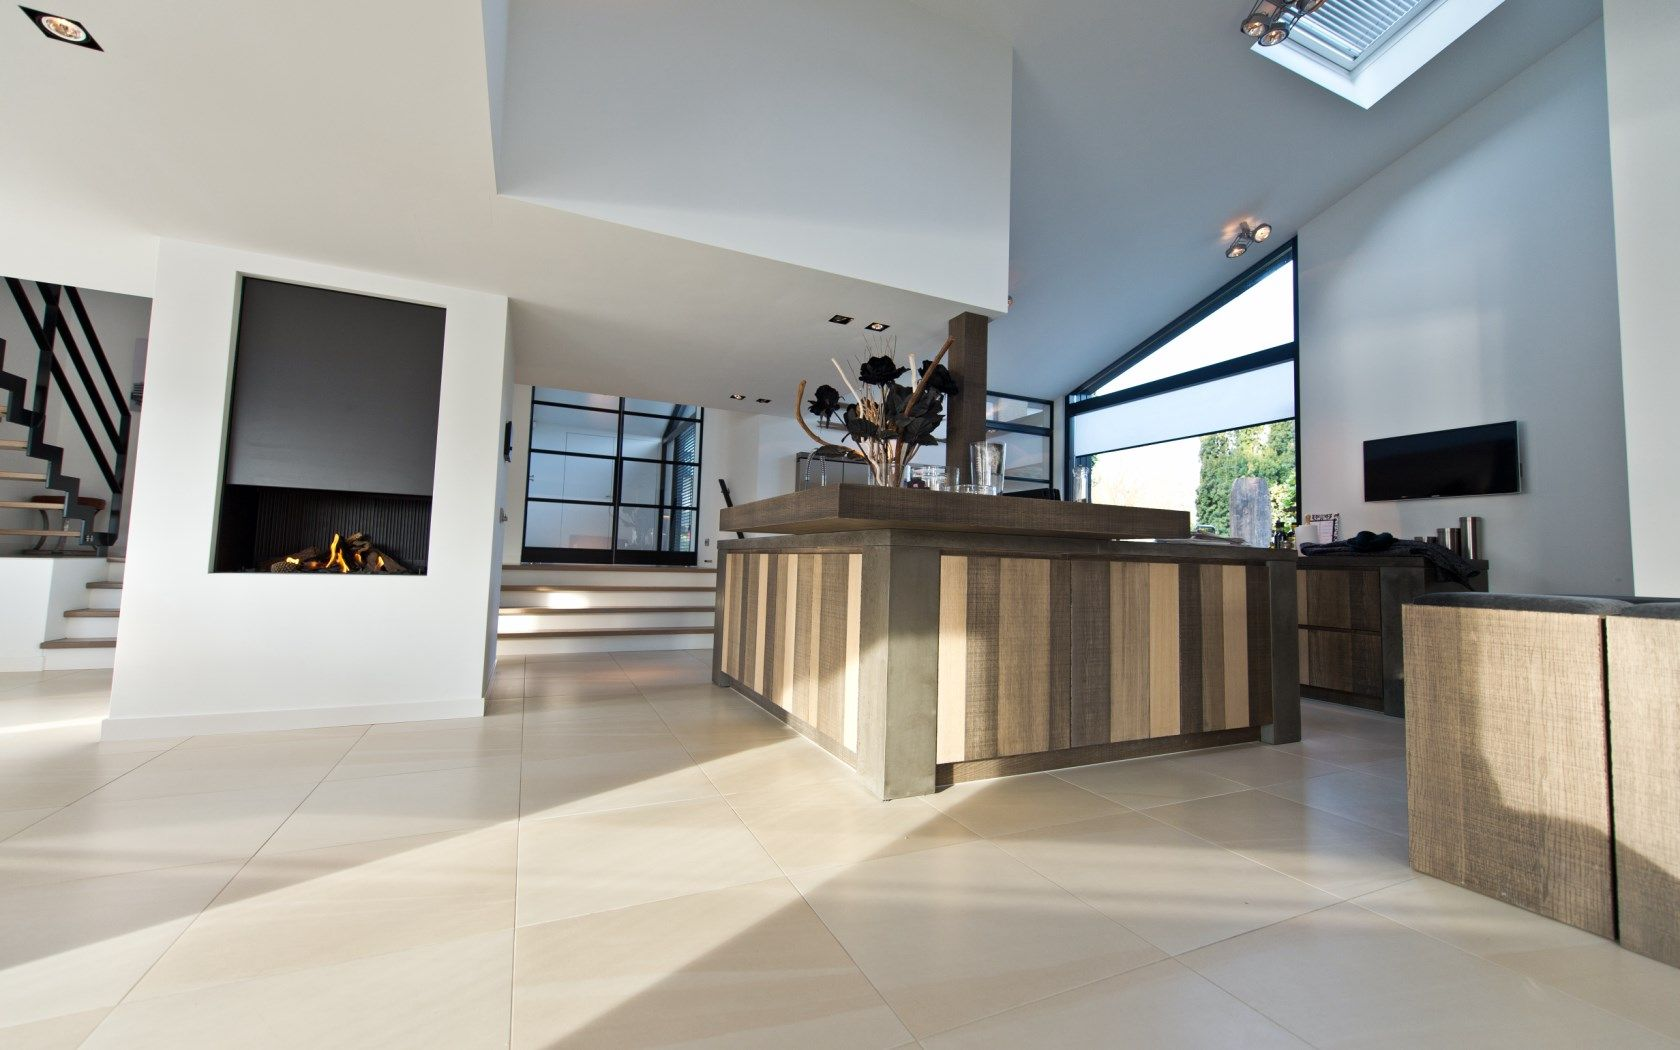 Top Design Keukens : High end keukens de absolute top in keukens keuken